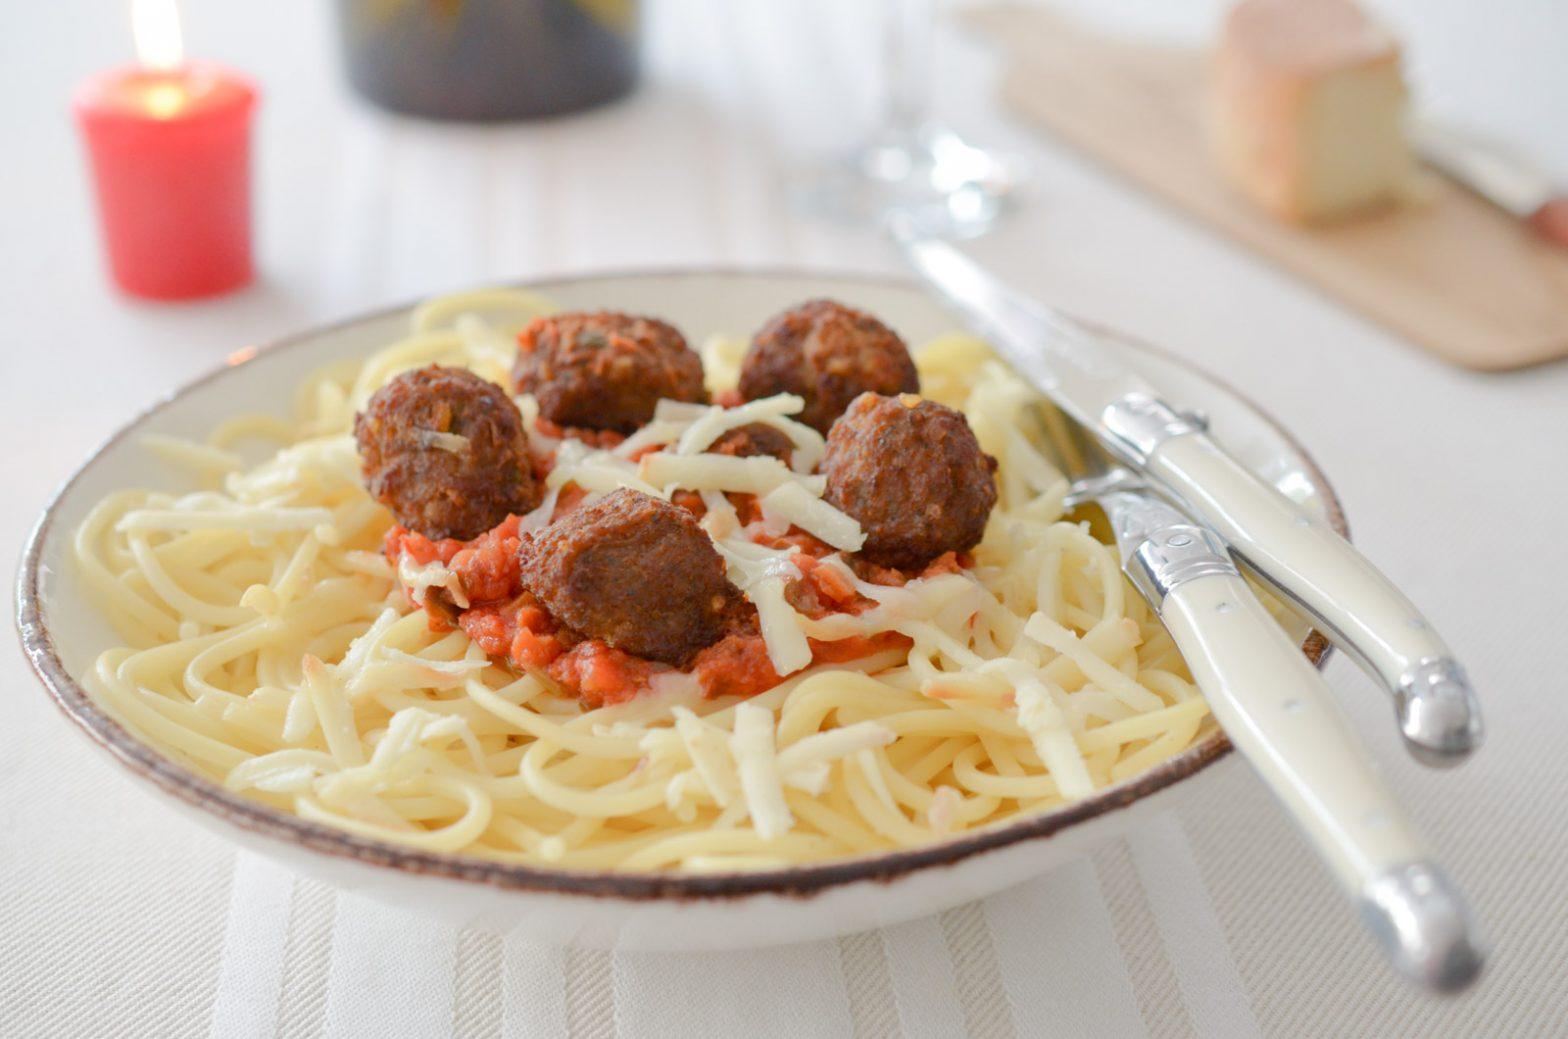 Menu enfant: plats et accompagnement malins